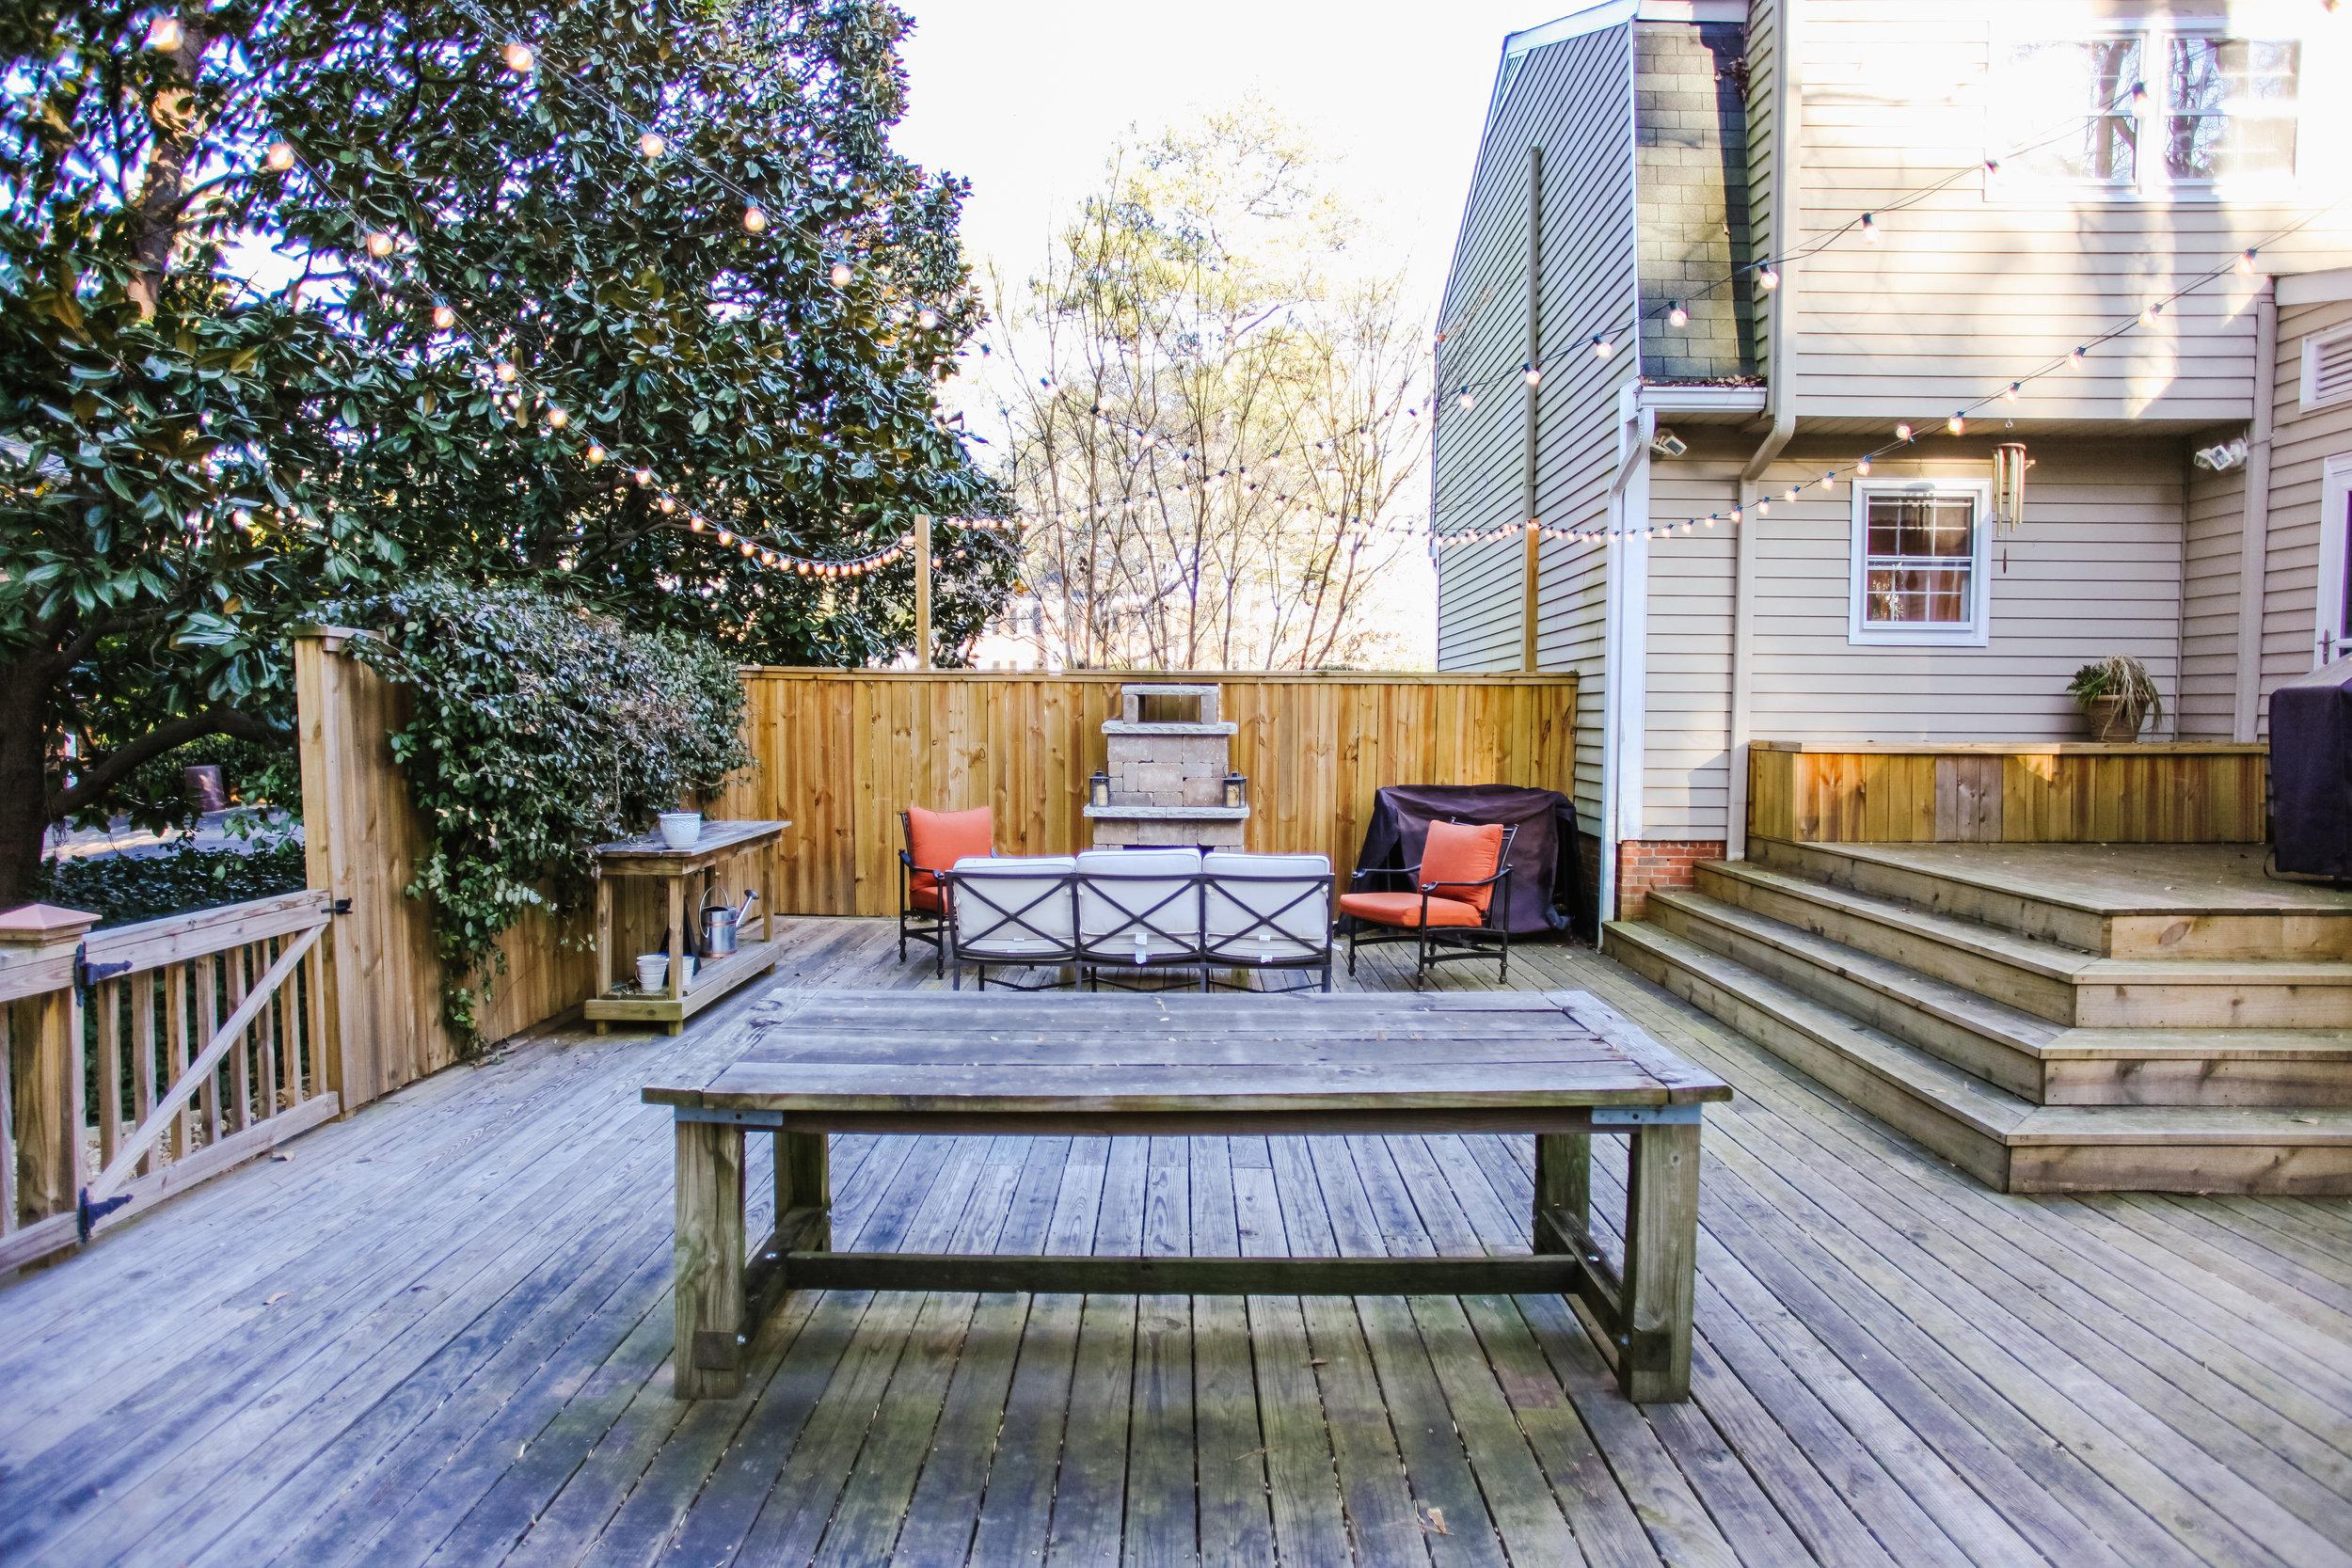 wingard-real-estate-sandy-springs-dream-home-backyard-goals-atlanta-buckhead-78.jpg